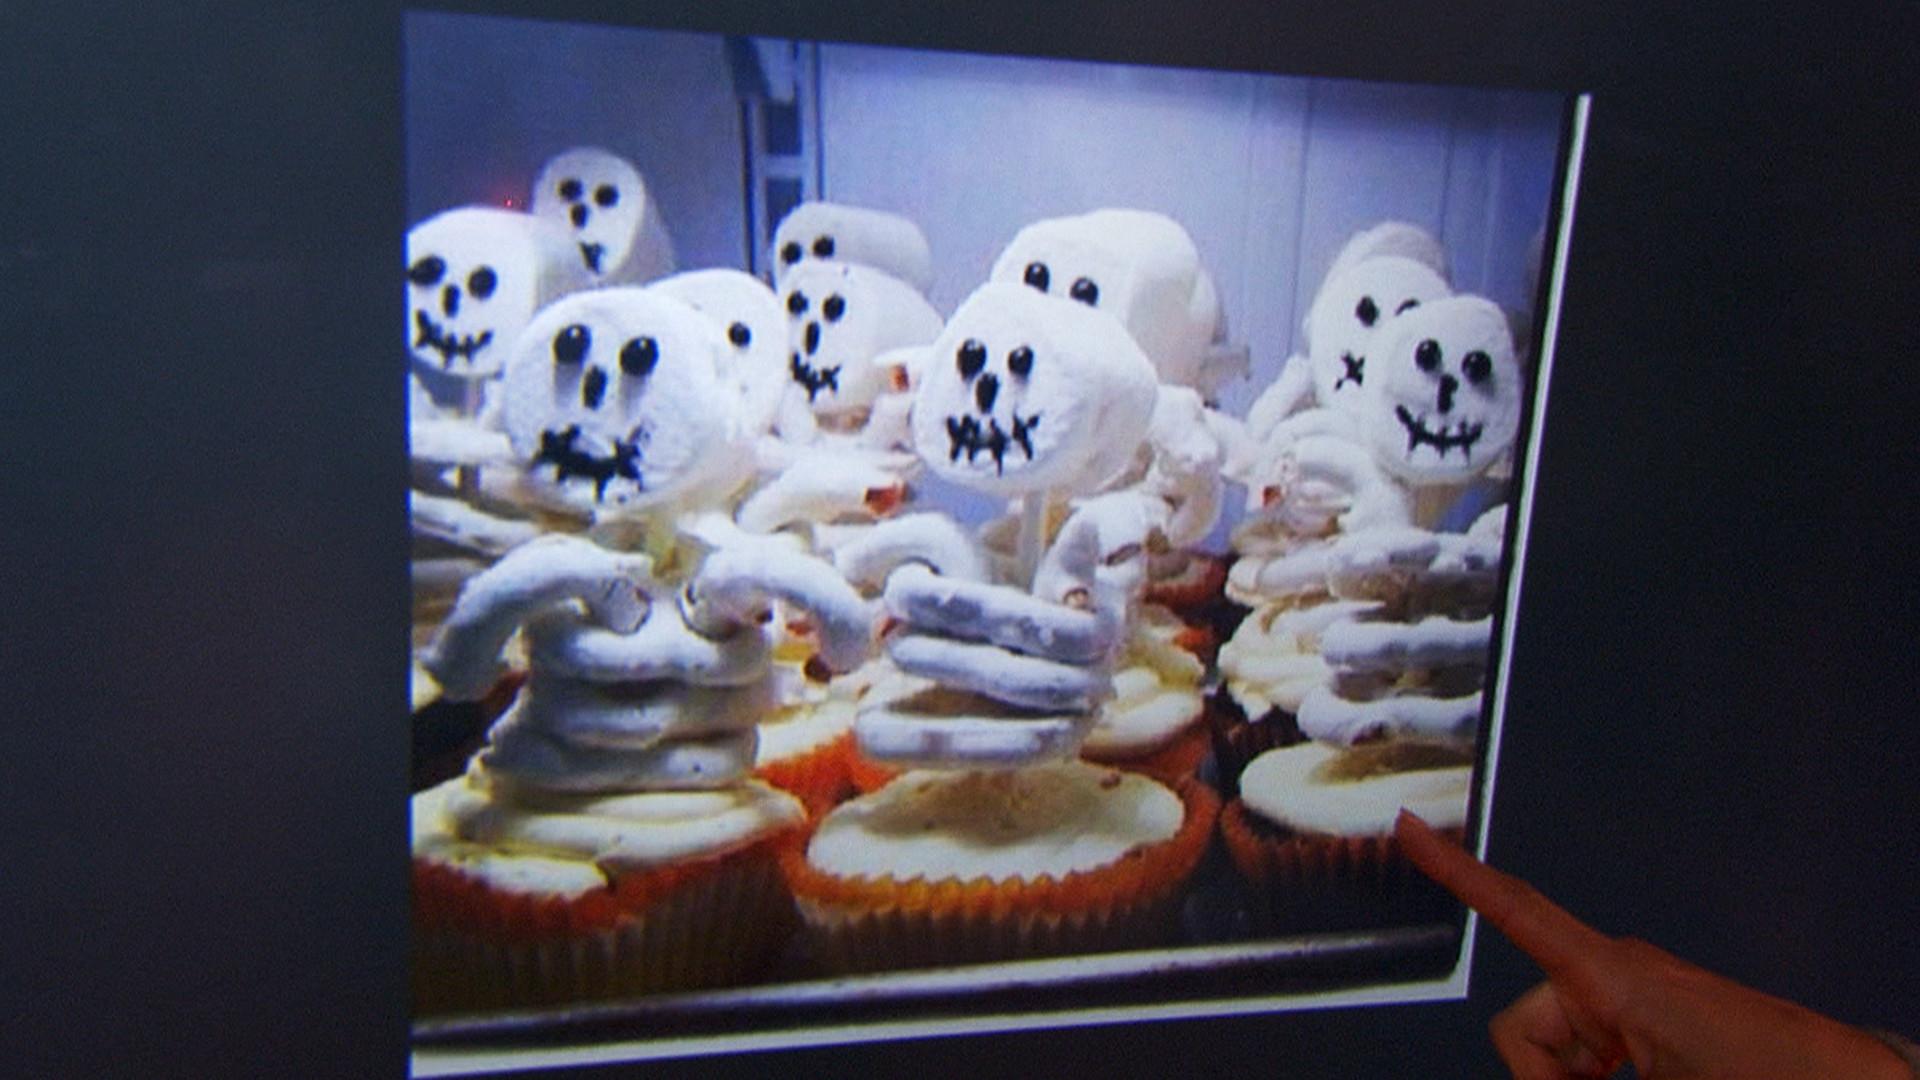 Creative Halloween Desserts  Skeleton cupcakes mummy cookies Your creative Halloween